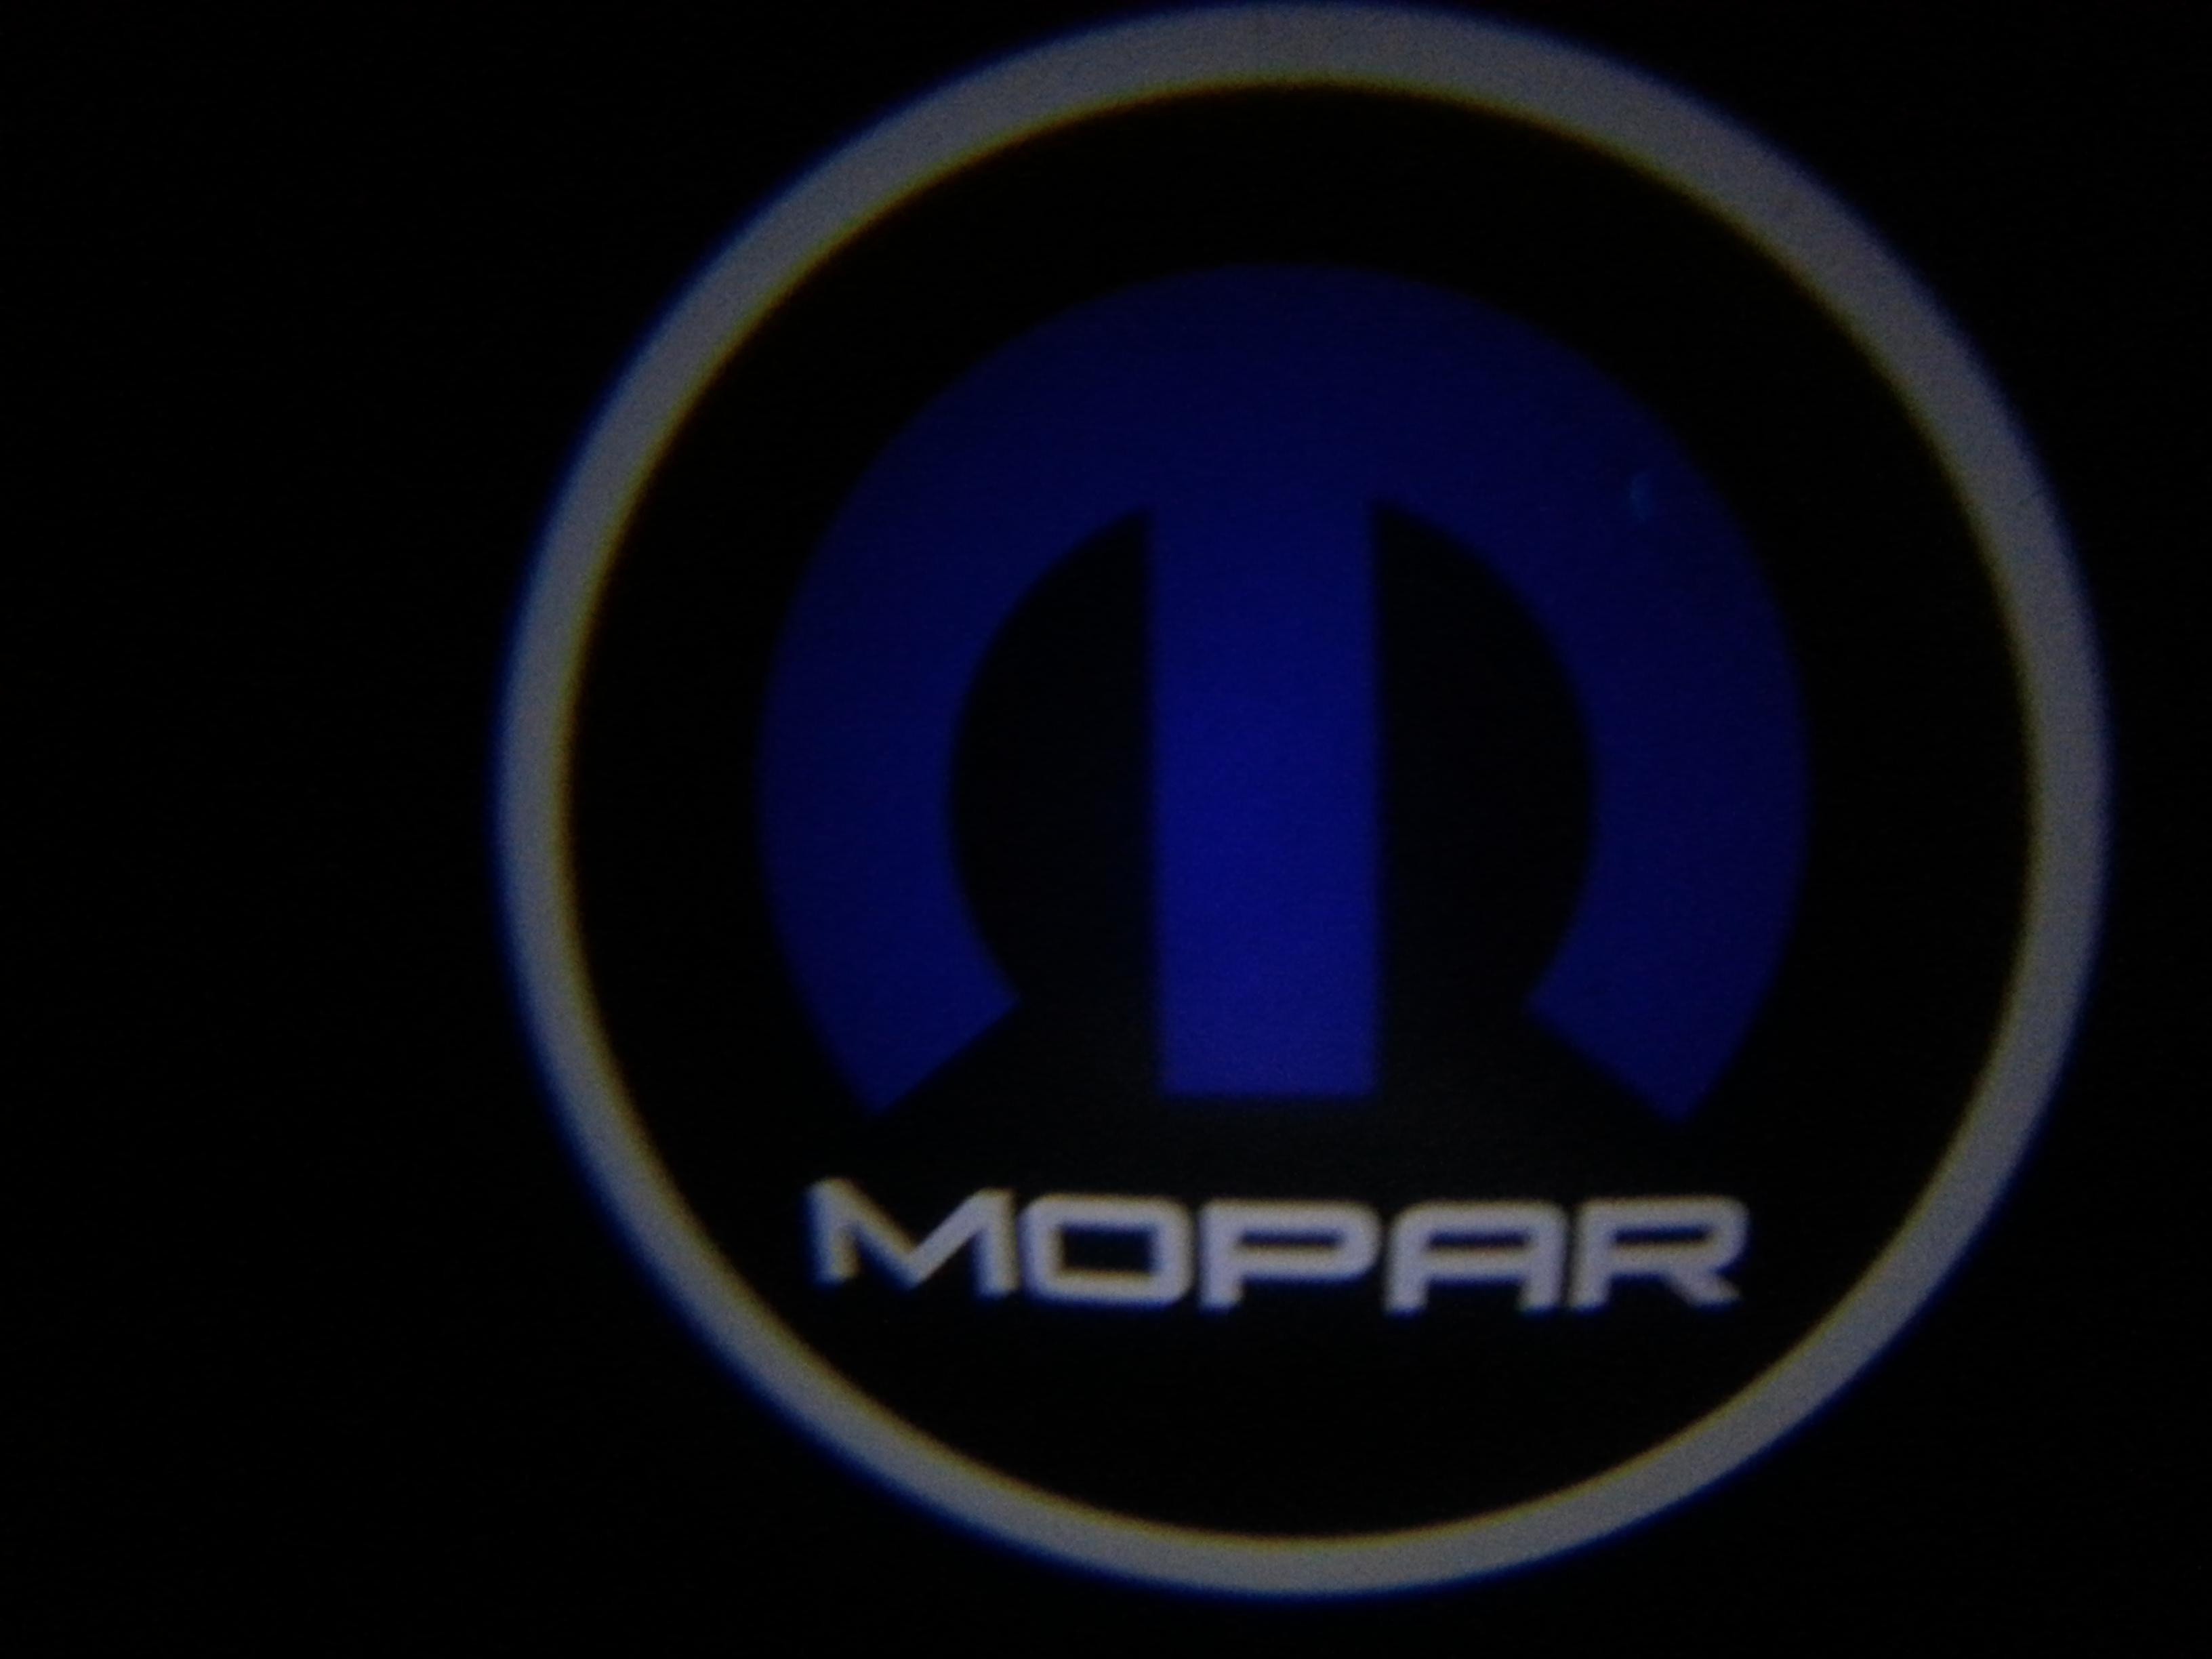 mopar logo mopar or no car logo mopar logo vector mopar logo png mopar 3264x2448